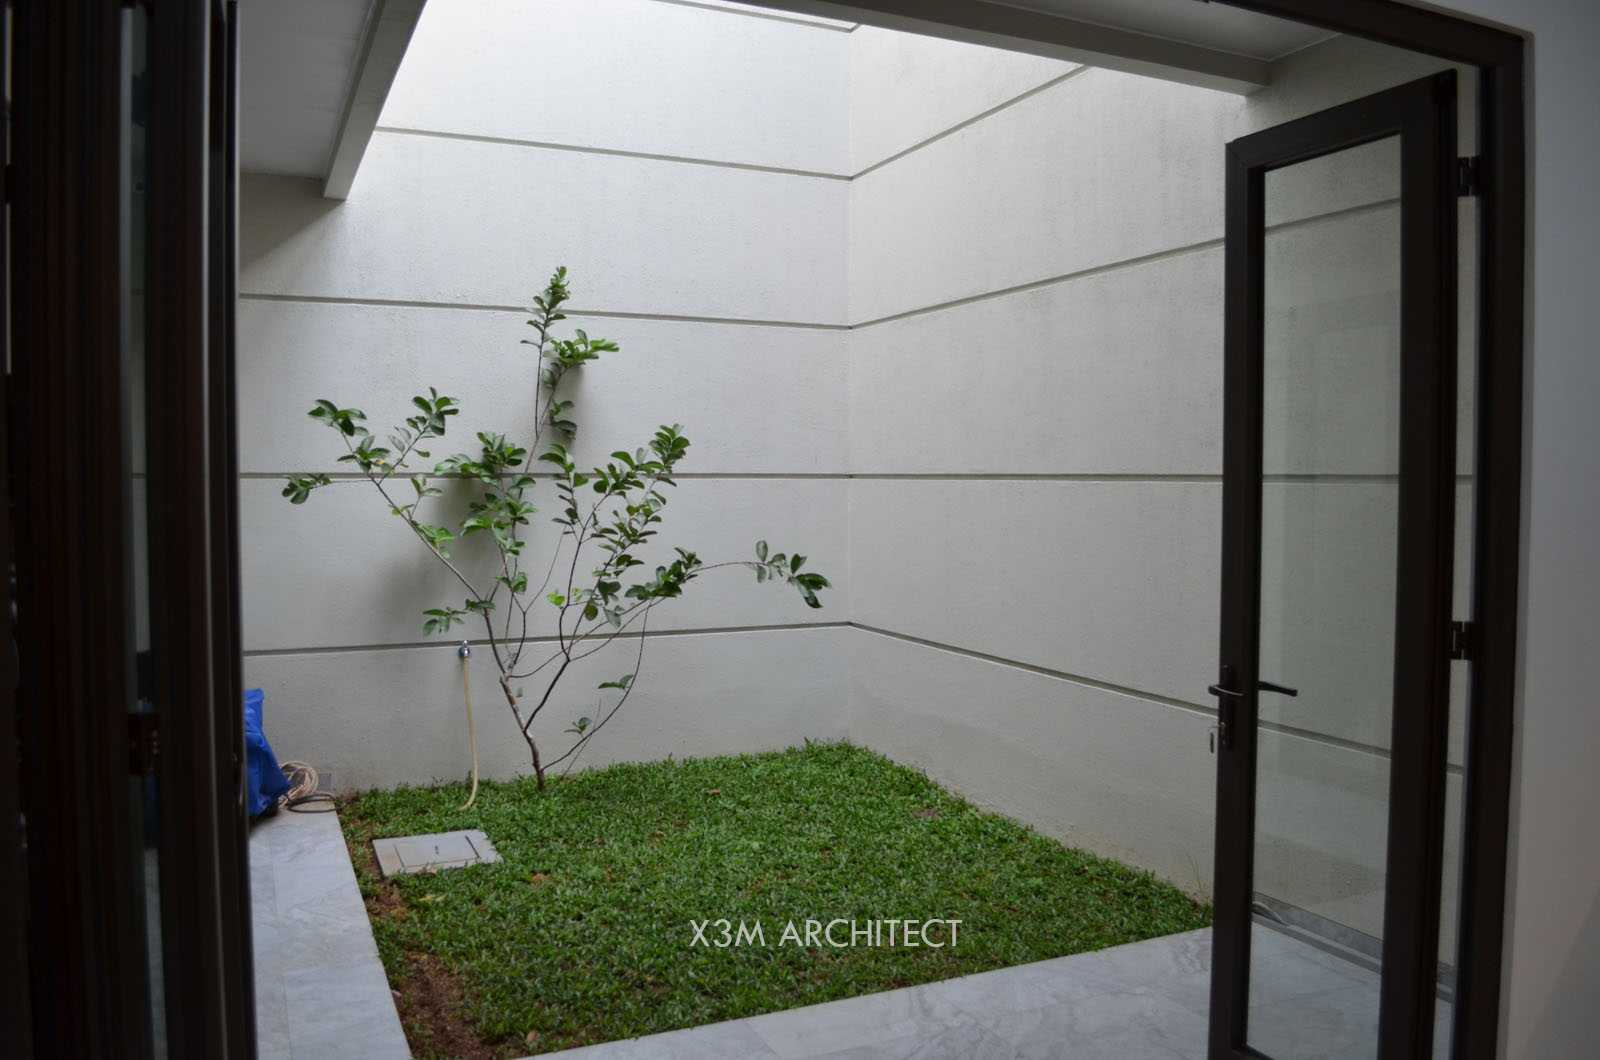 X3M Architects Gl Residence Berjaya Asia Bsd Office 2Th Floor Jl. Griya Loka Raya Bj-26, Rw. Buntu, Kec. Serpong, Kota Tangerang Selatan, Banten 15318, Indonesia Berjaya Asia Bsd Office 2Th Floor Jl. Griya Loka Raya Bj-26, Rw. Buntu, Kec. Serpong, Kota Tangerang Selatan, Banten 15318, Indonesia X3M-Architects-Gl-Residence  101568